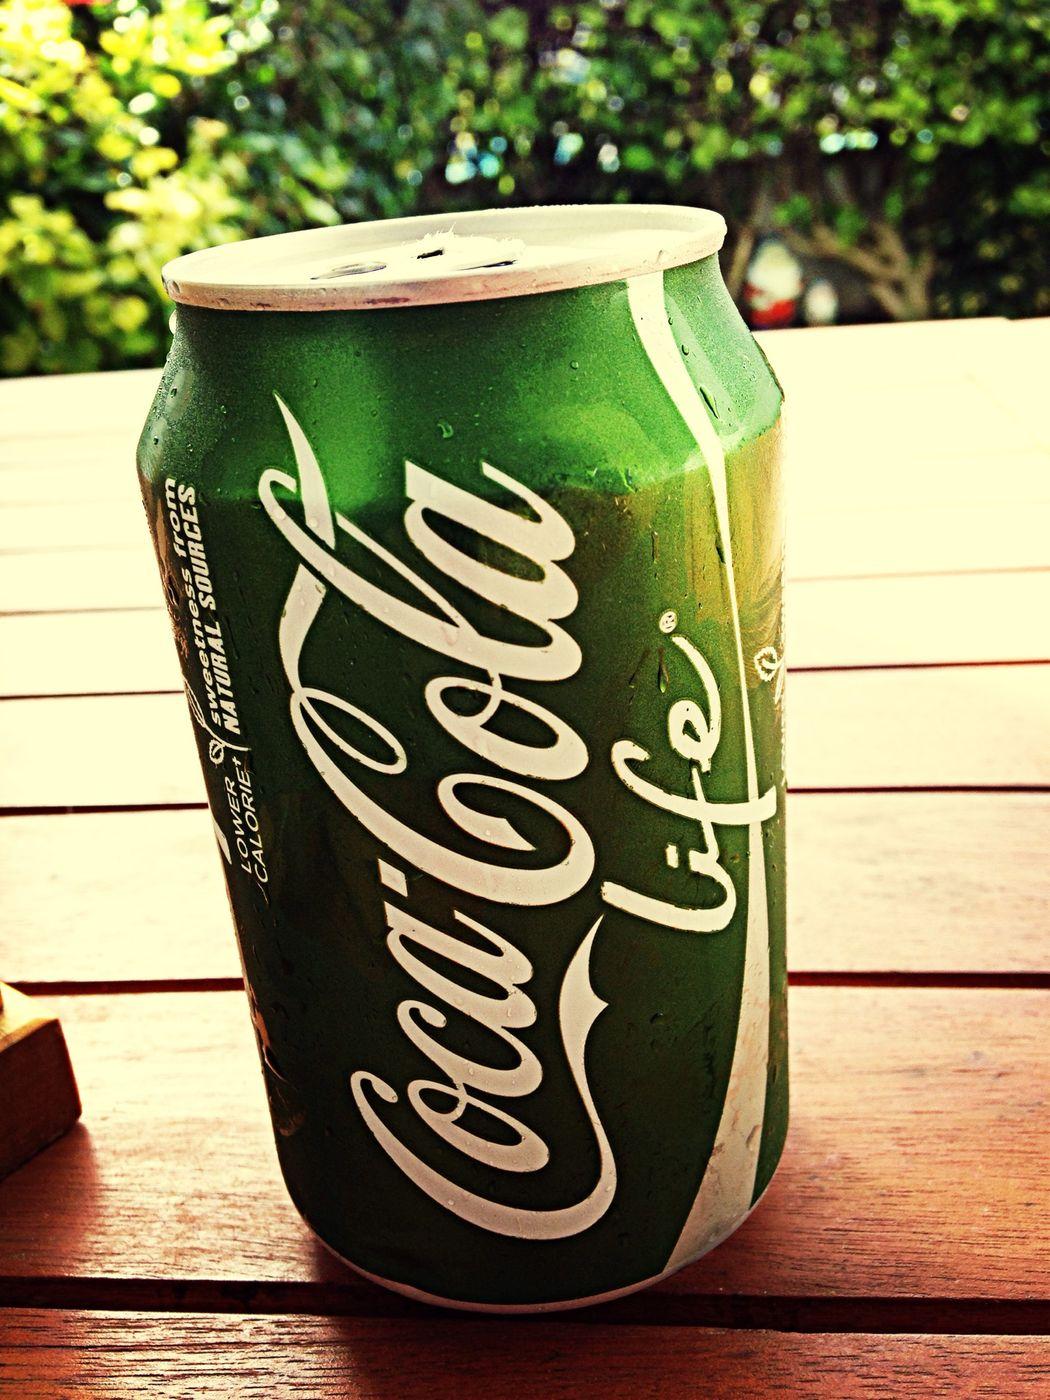 Cocacola Verde Drinking Coke GreenCoke Verde que te quiero verde mmmm